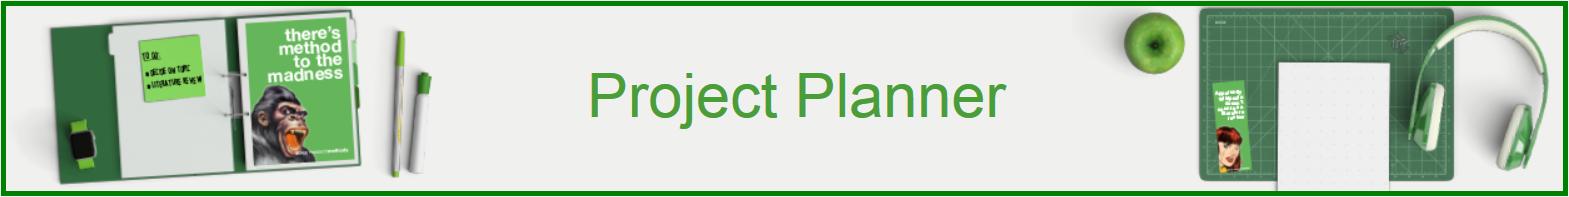 SAGE Project Planner banner